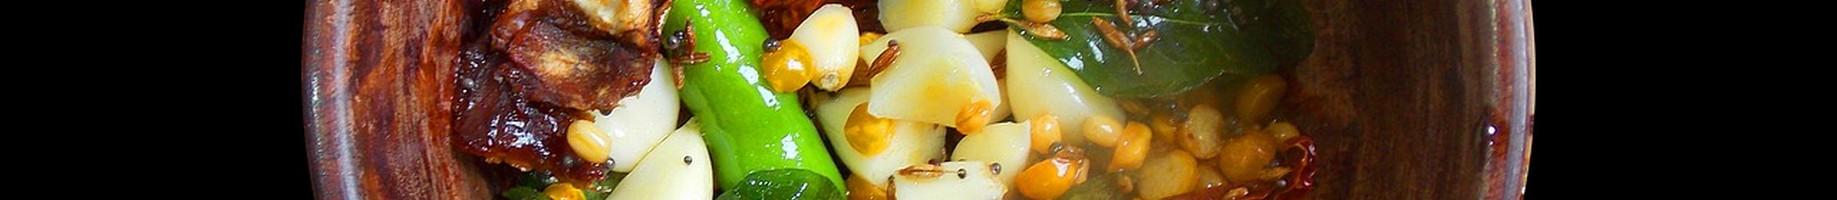 indian-food-1784879_1280